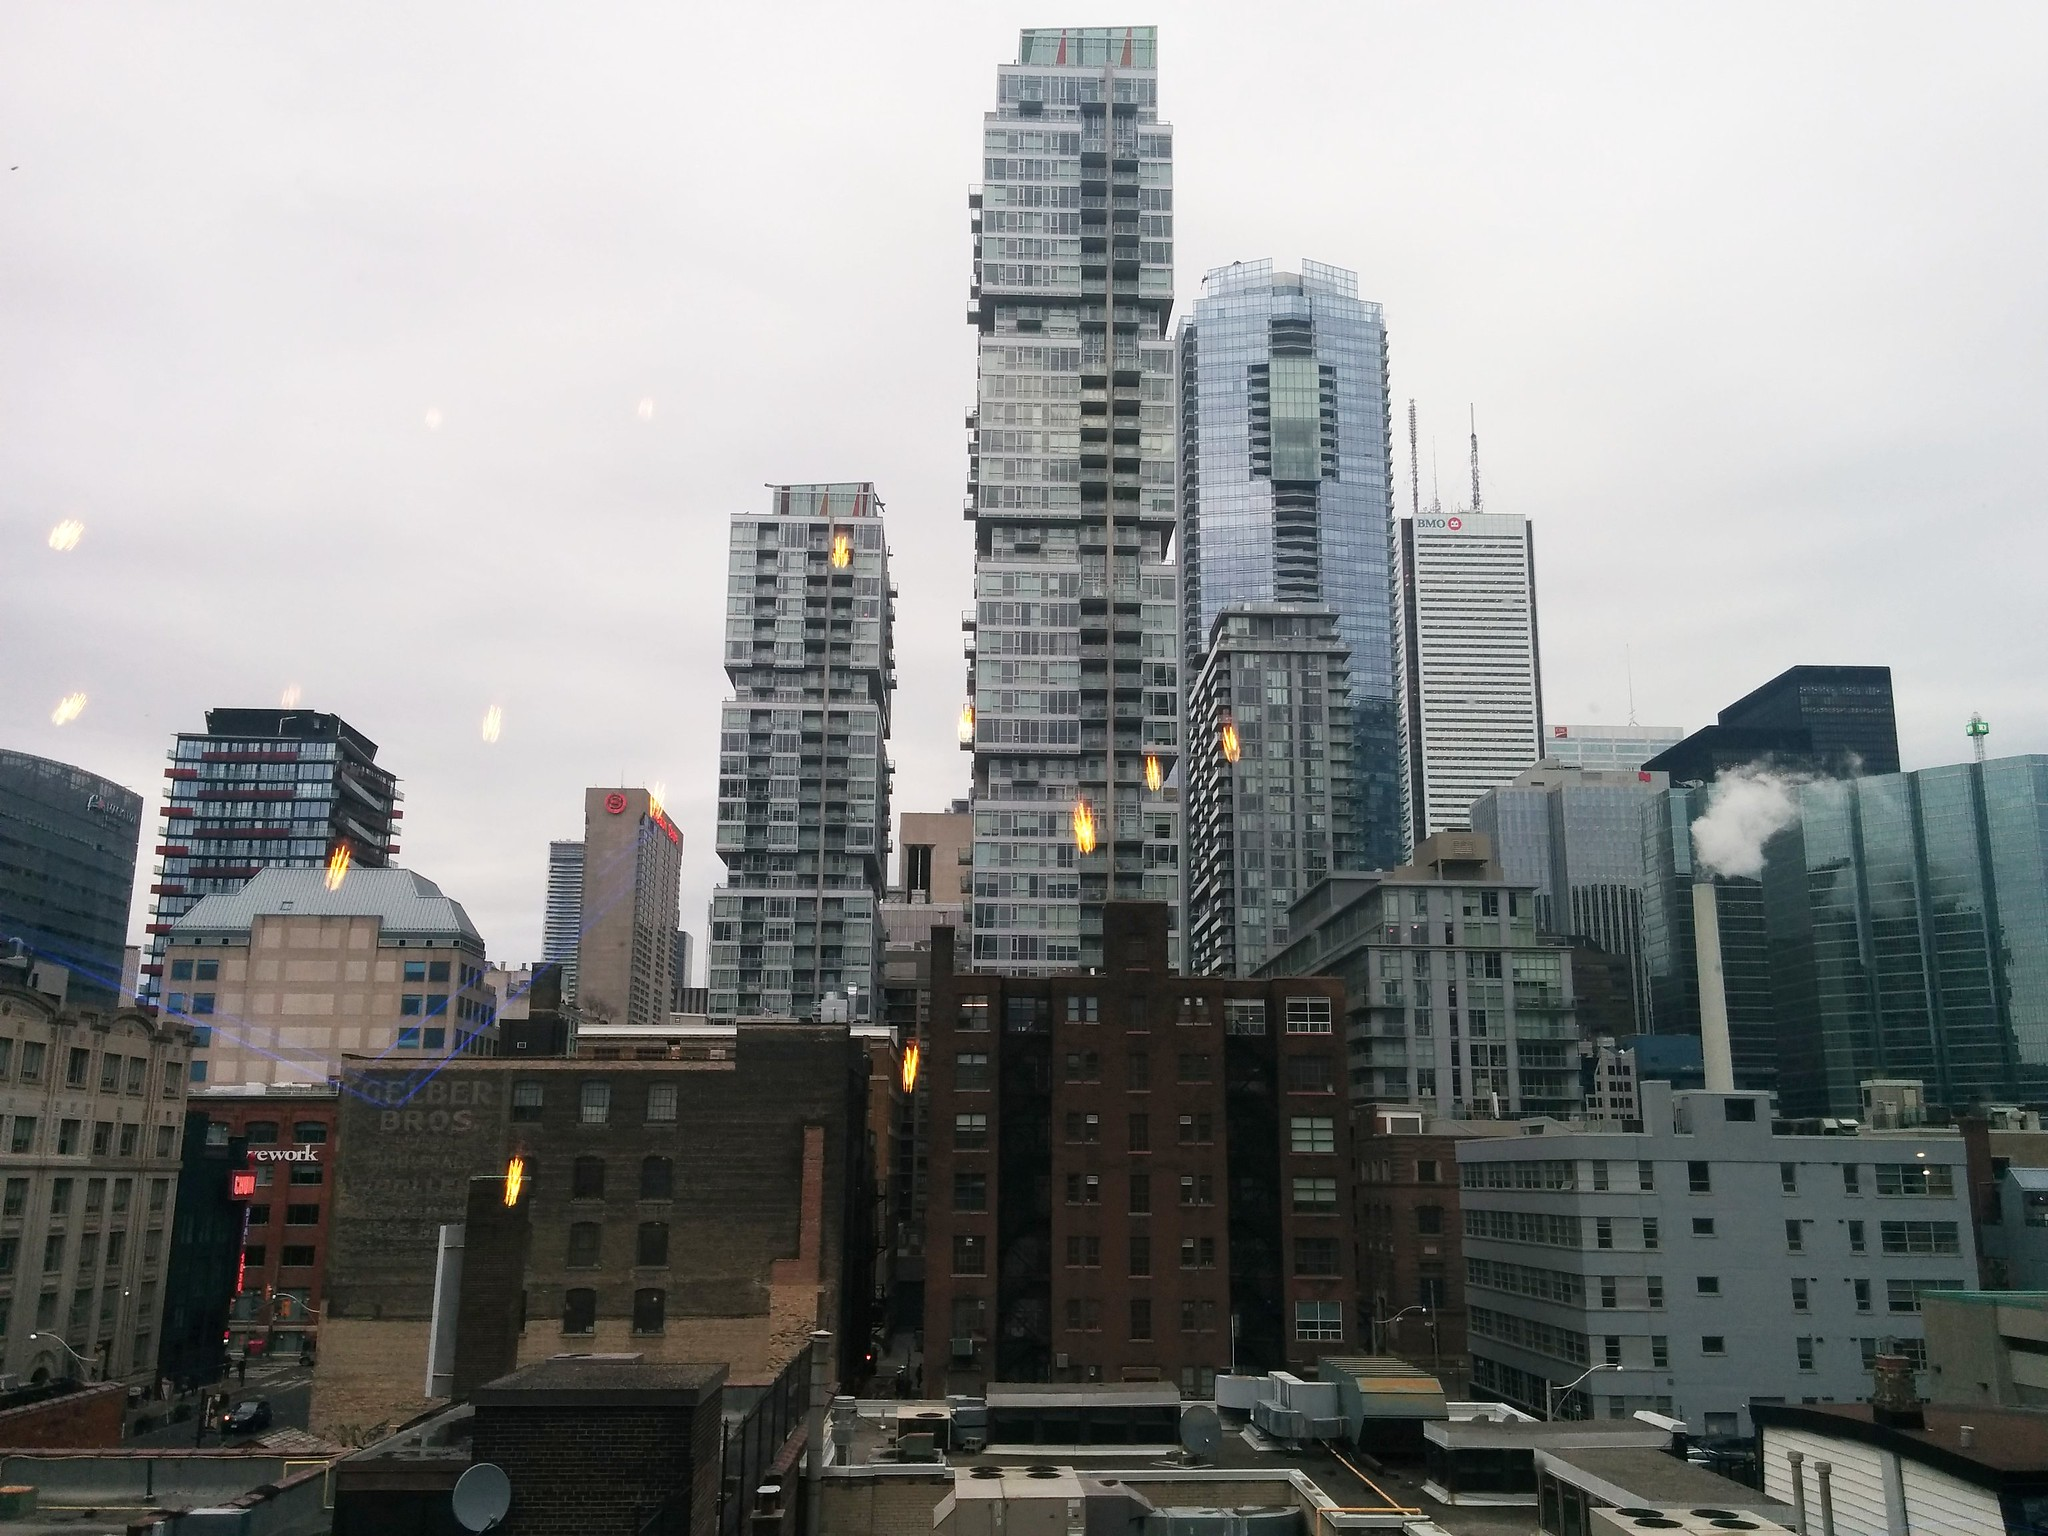 Looking east out the Scotiabank window #toronto #entertainmentdistrict #financialdistrict #scotiabanktheatre #skyline